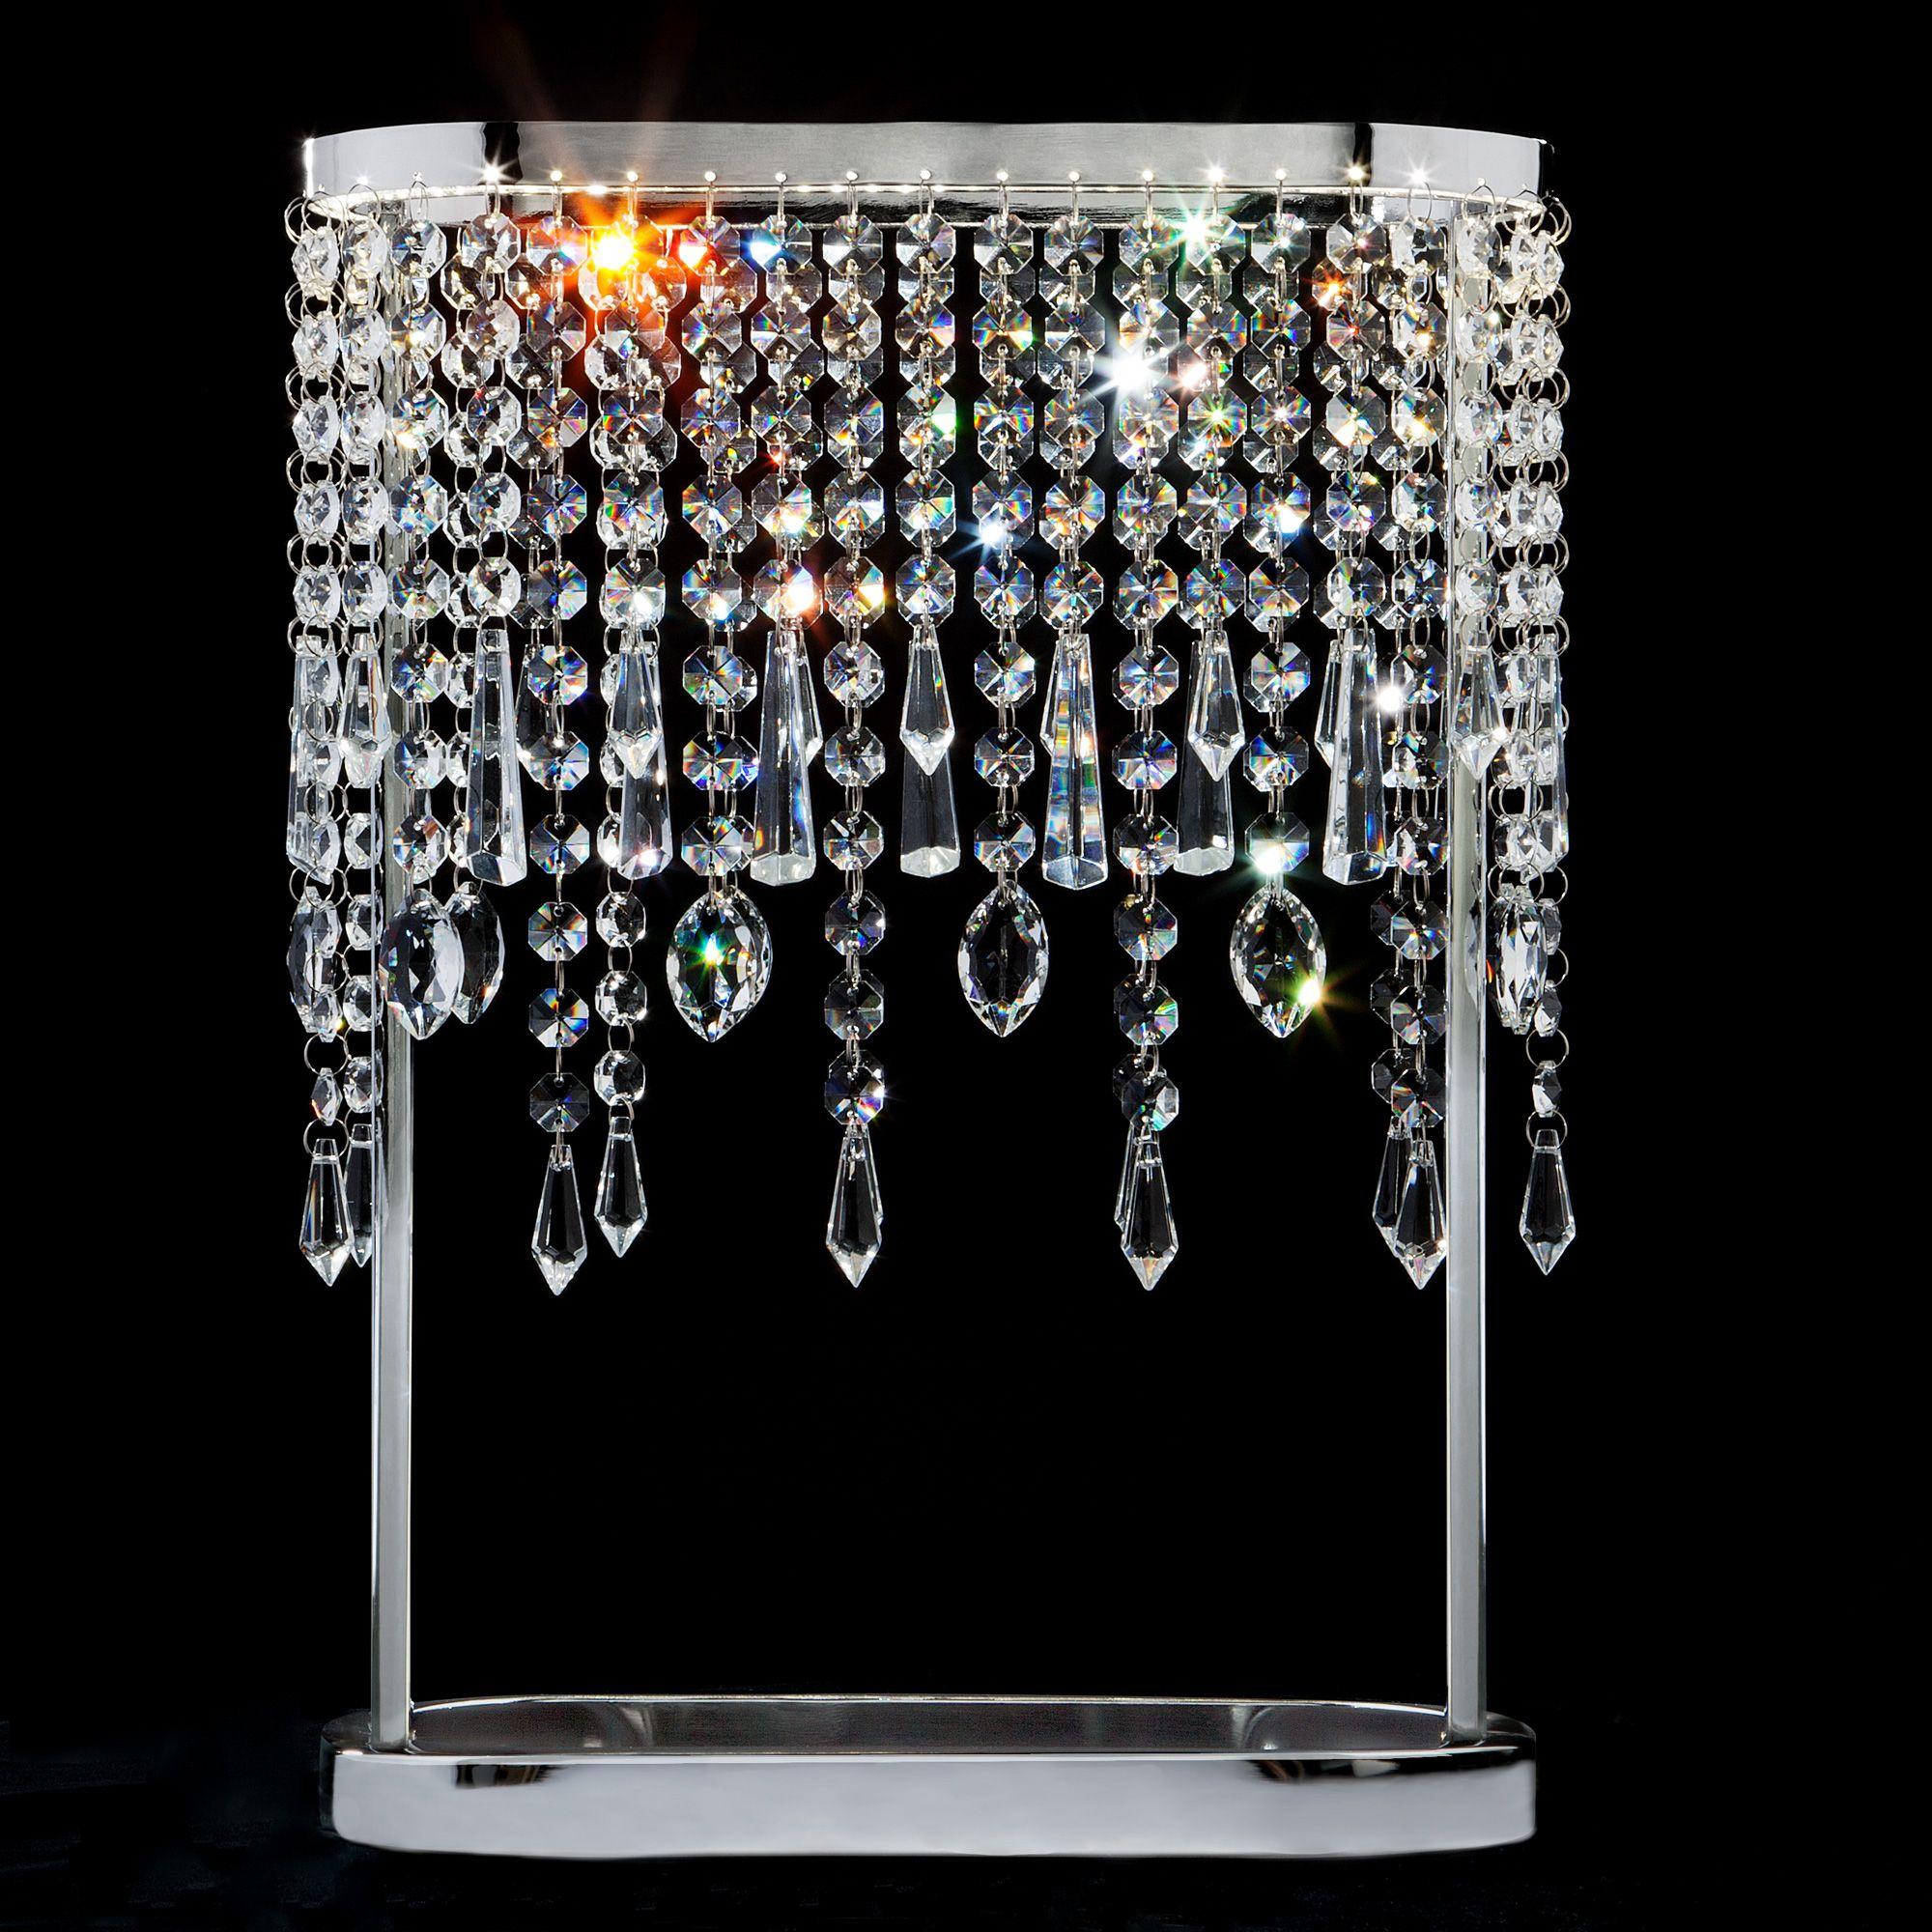 Светодиодная настольная лампа с хрусталем 80413/1 хром